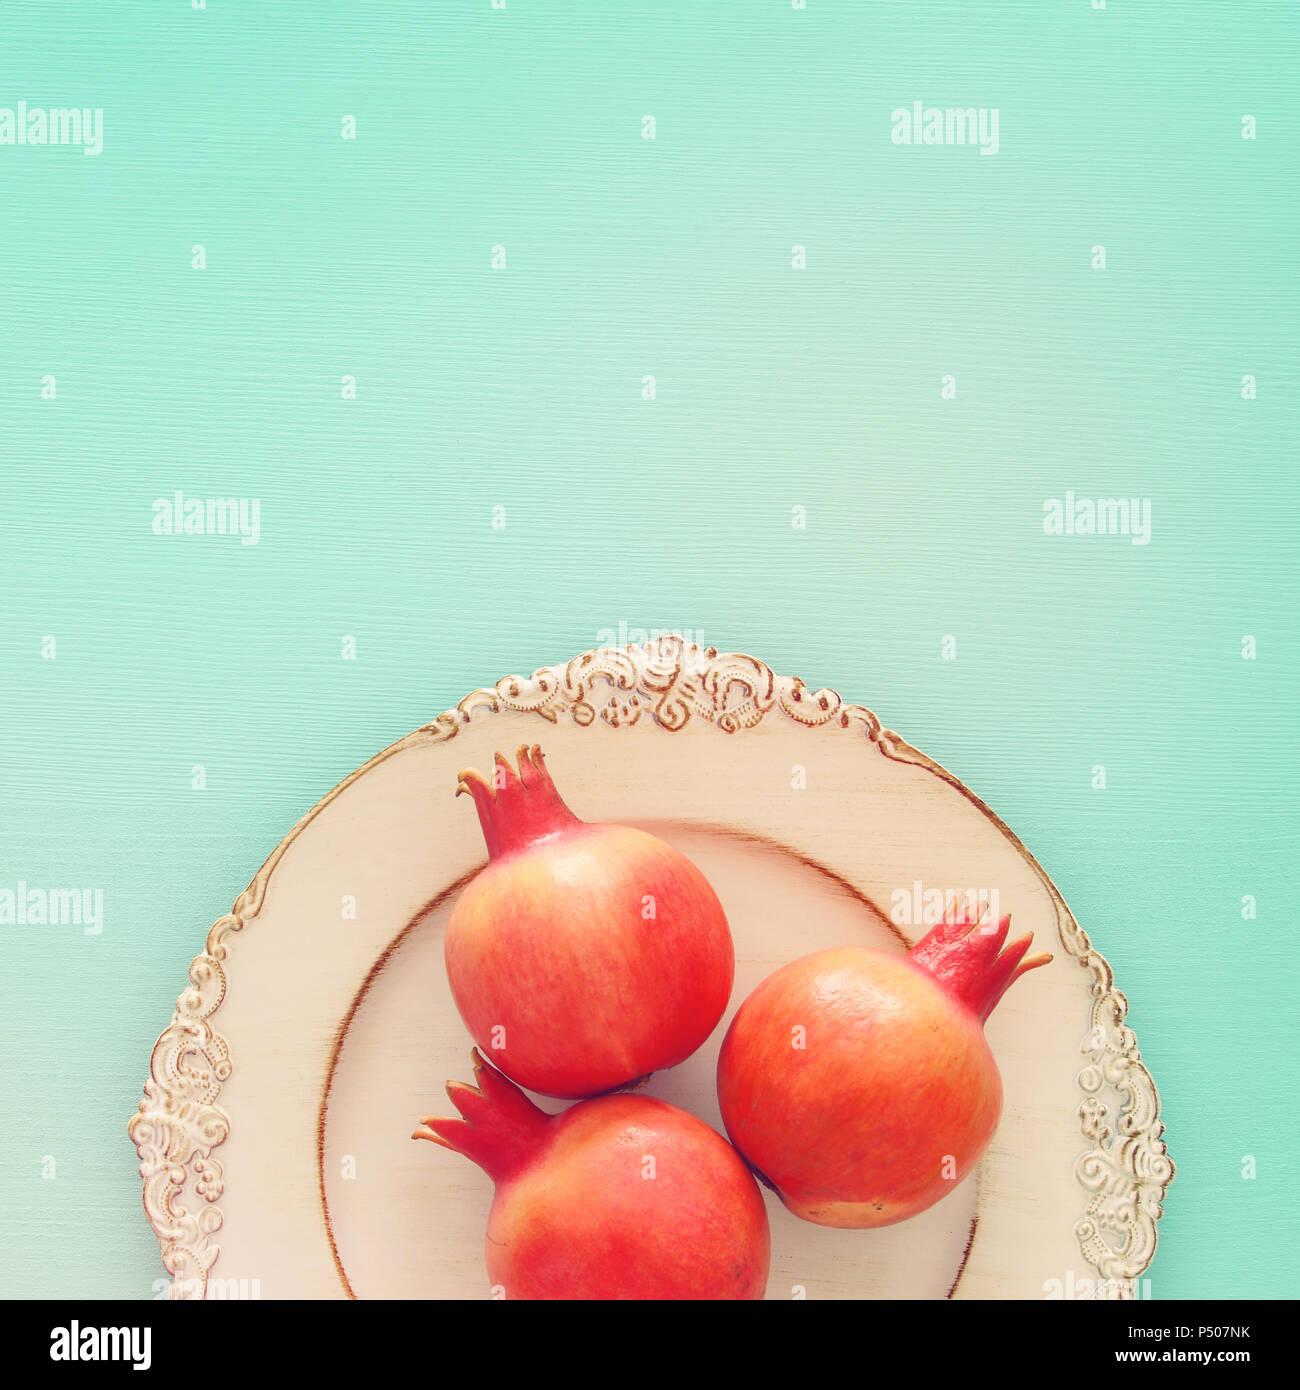 Rosh Hashanah Jewish New Year Holiday Concept Pomegranate